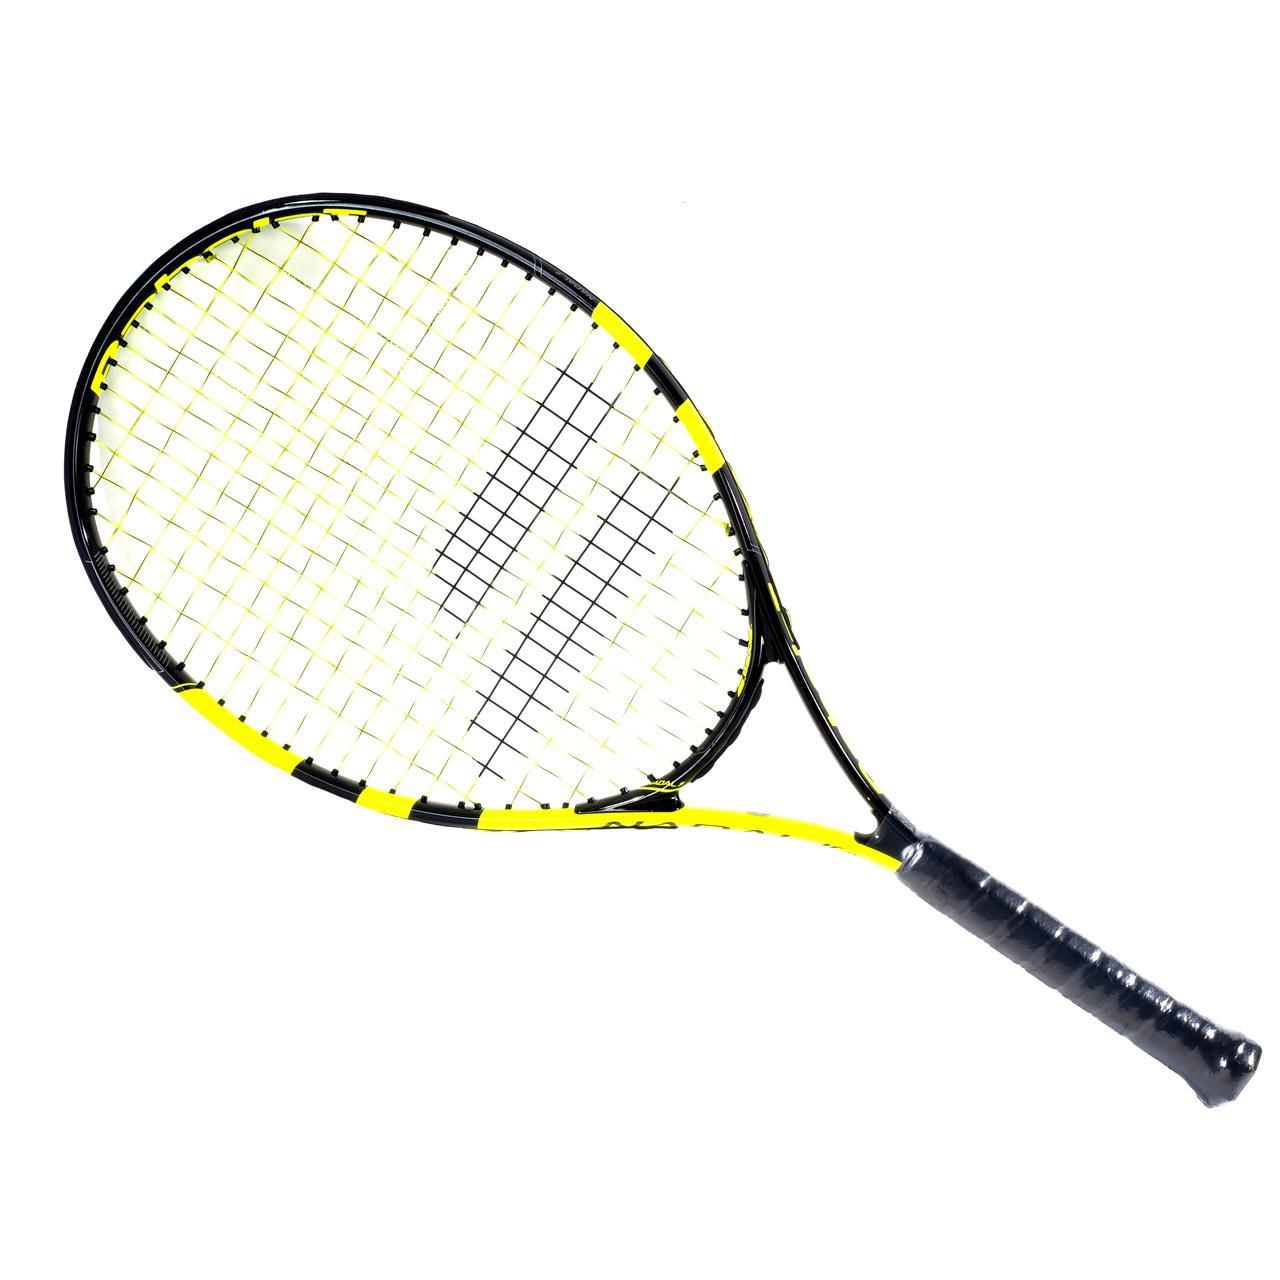 raquette de tennis babolat nadal 26 2016 noir 78304 neuf